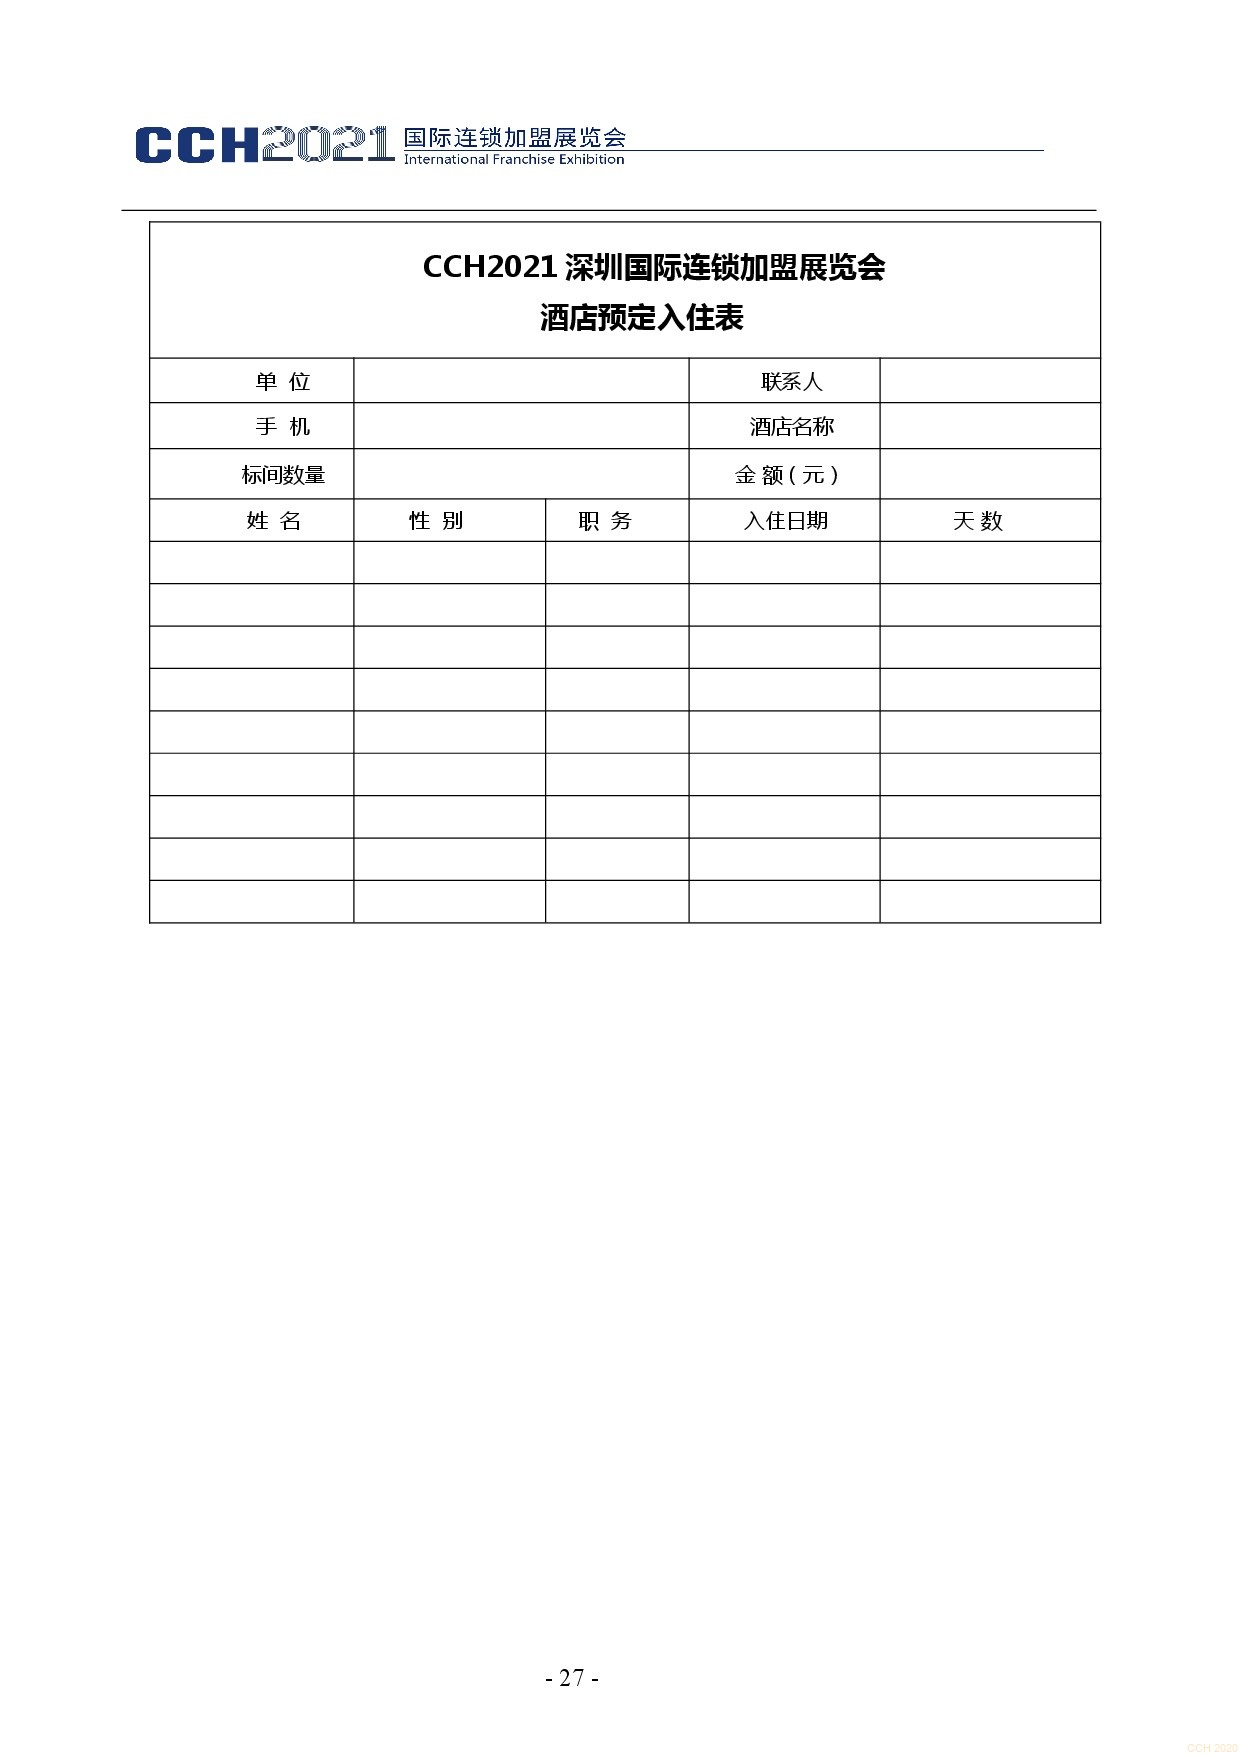 0416CCH深圳展参展商手册4.16-027.jpg